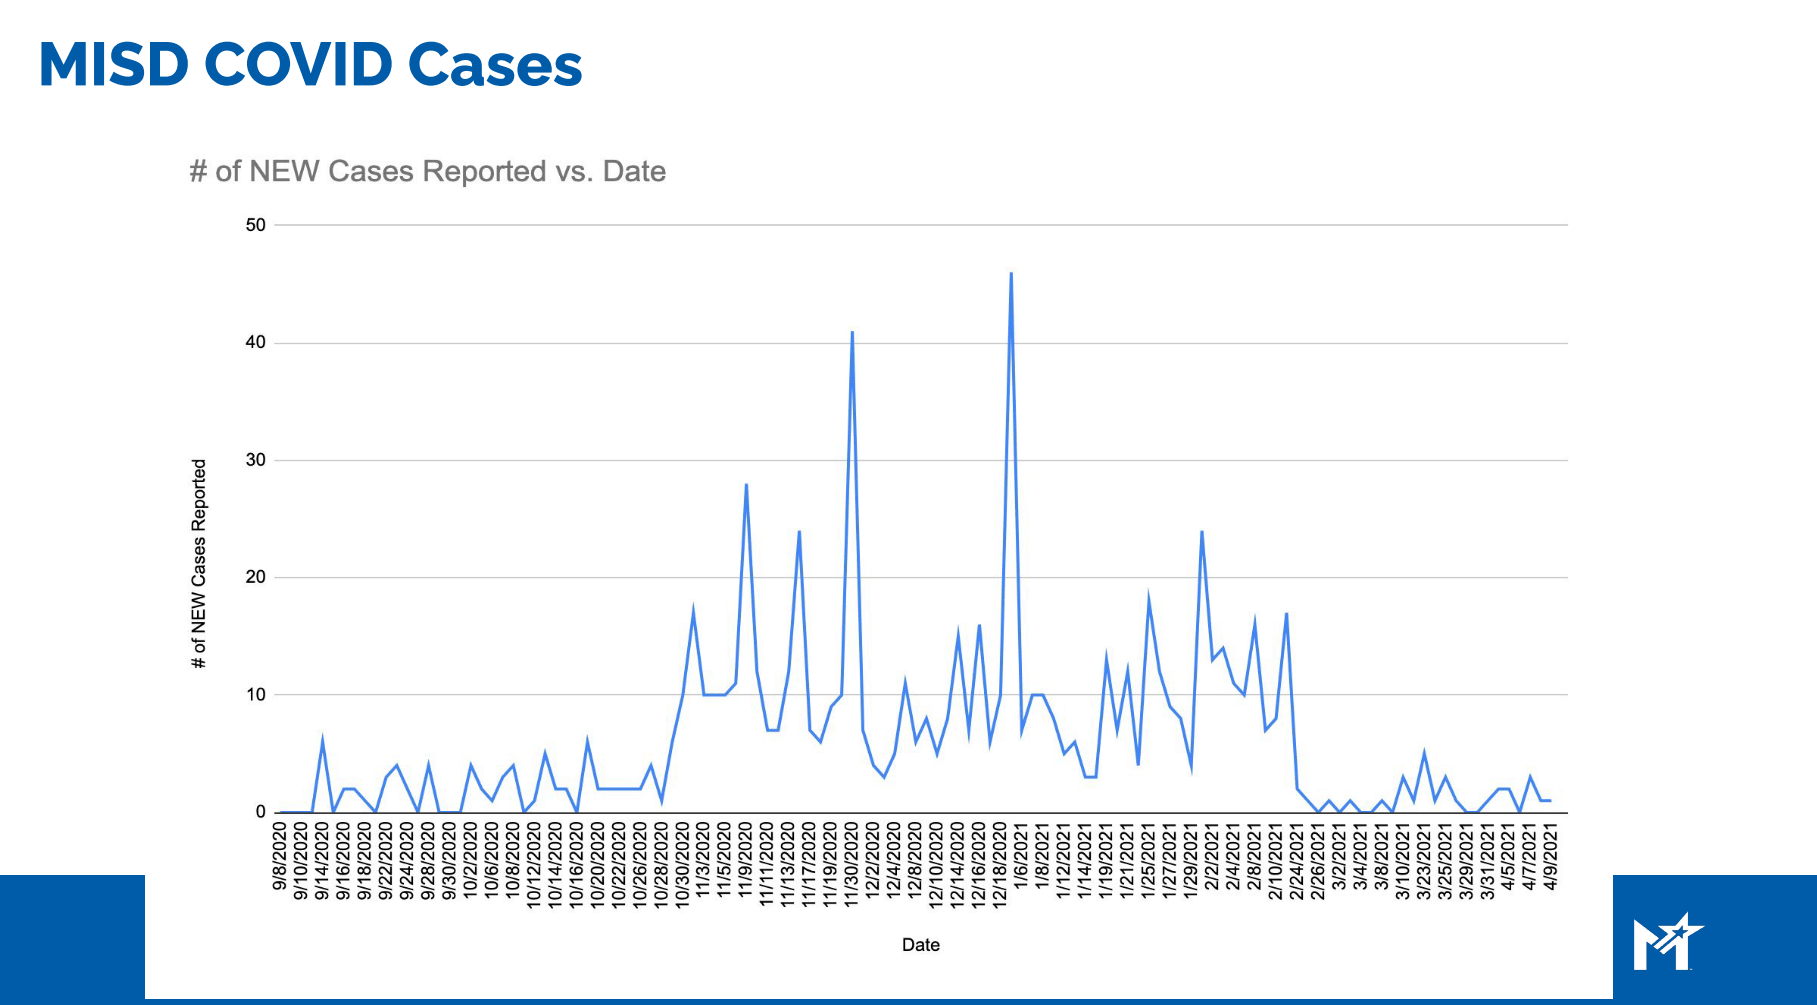 MISD Covid Cases